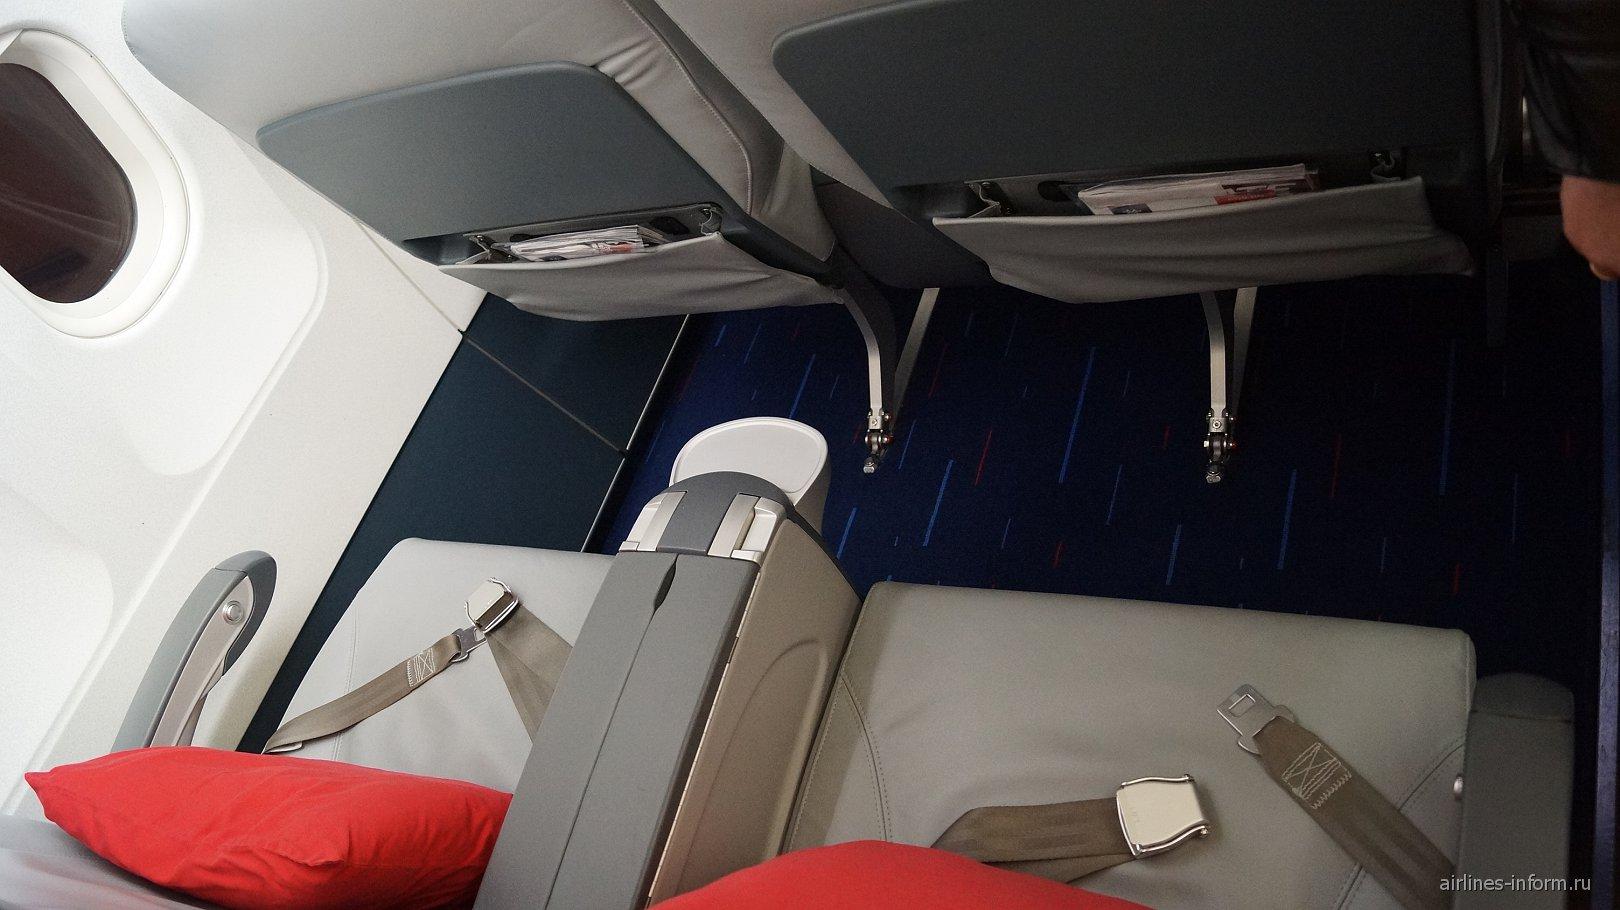 Бизнес-класс в самолете Airbus A320 авиакомпании Air Serbia